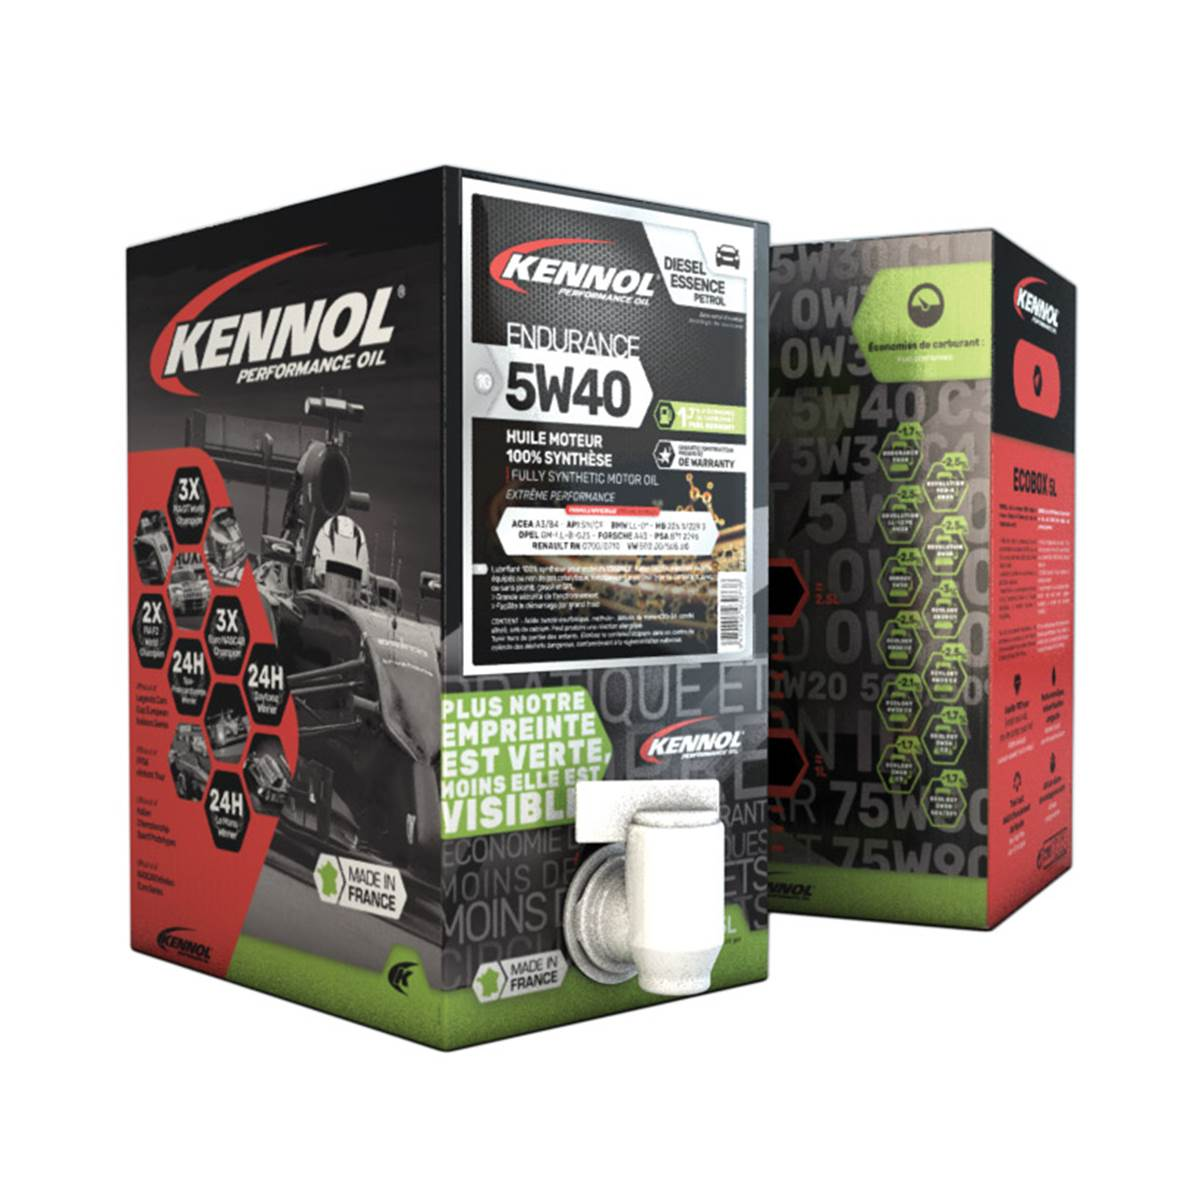 Huile moteur KENNOL Ecobox 5W40 A3/B4 5L